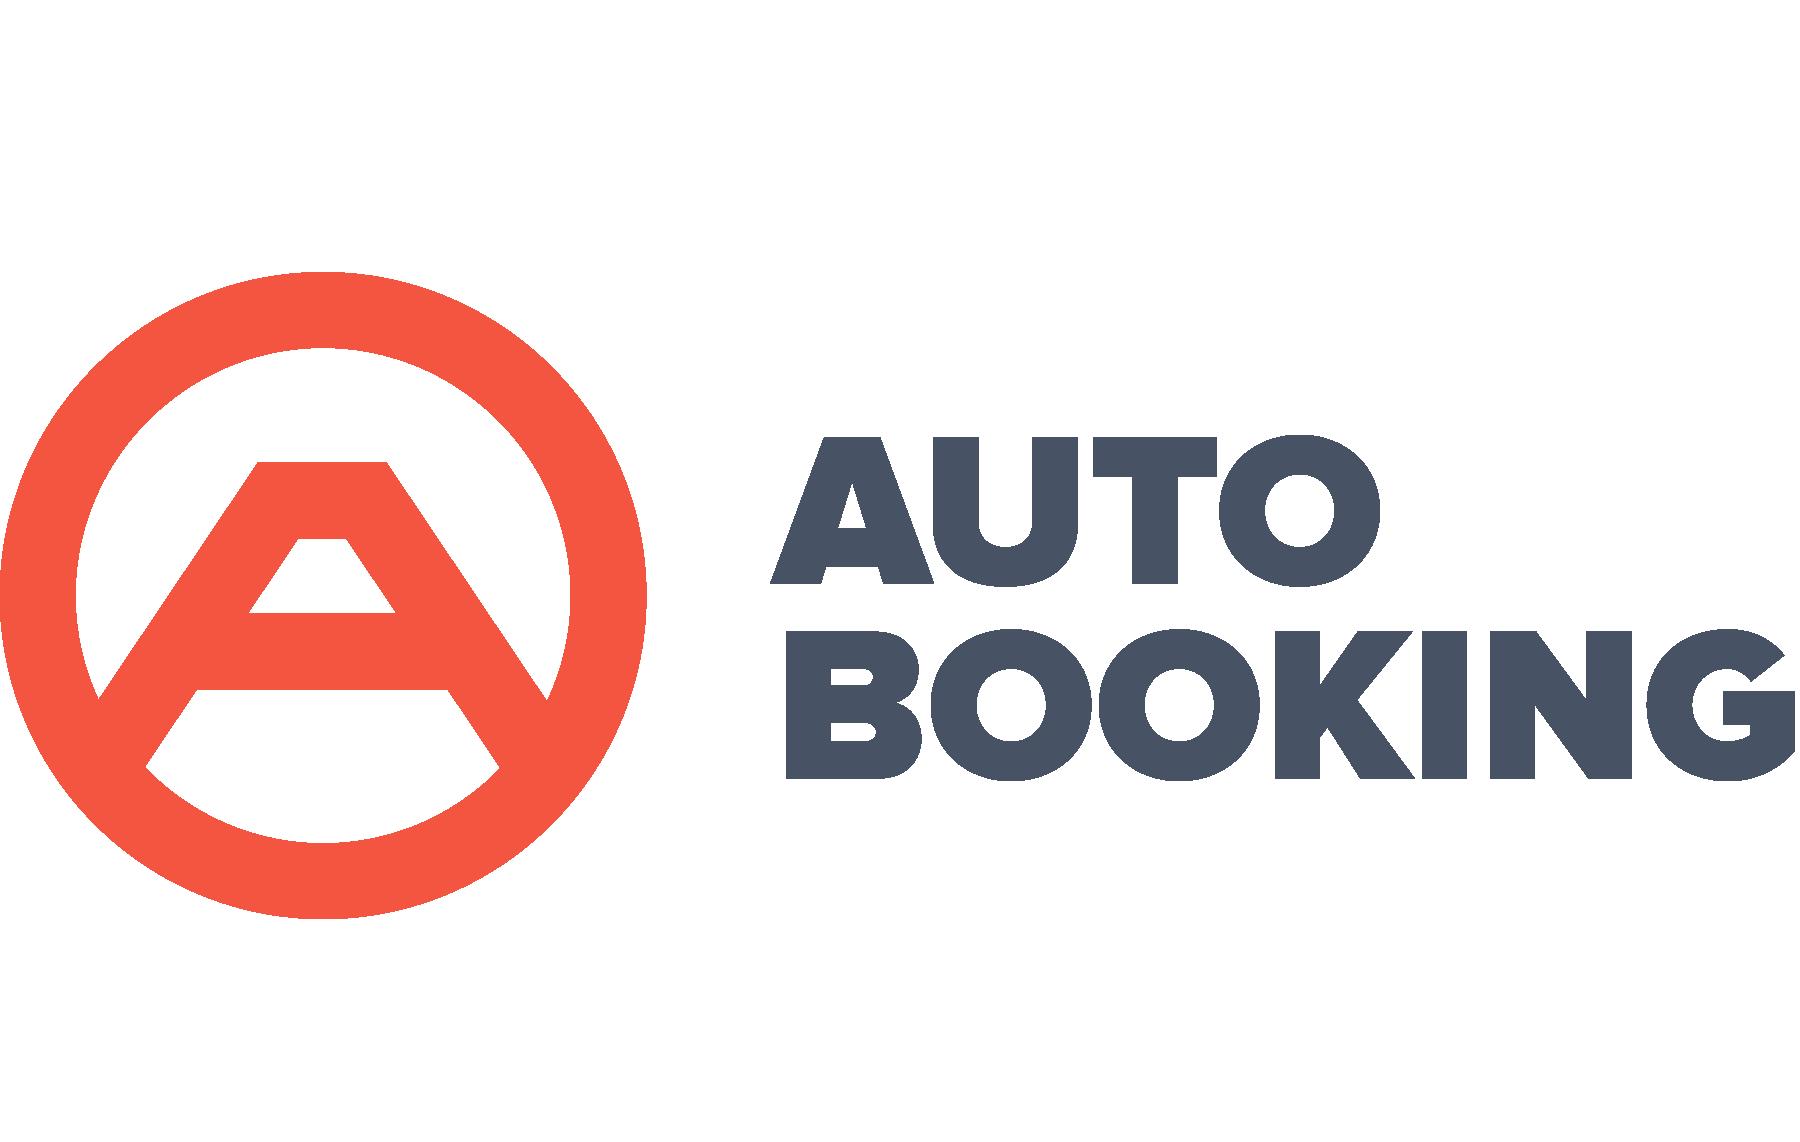 Autobooking